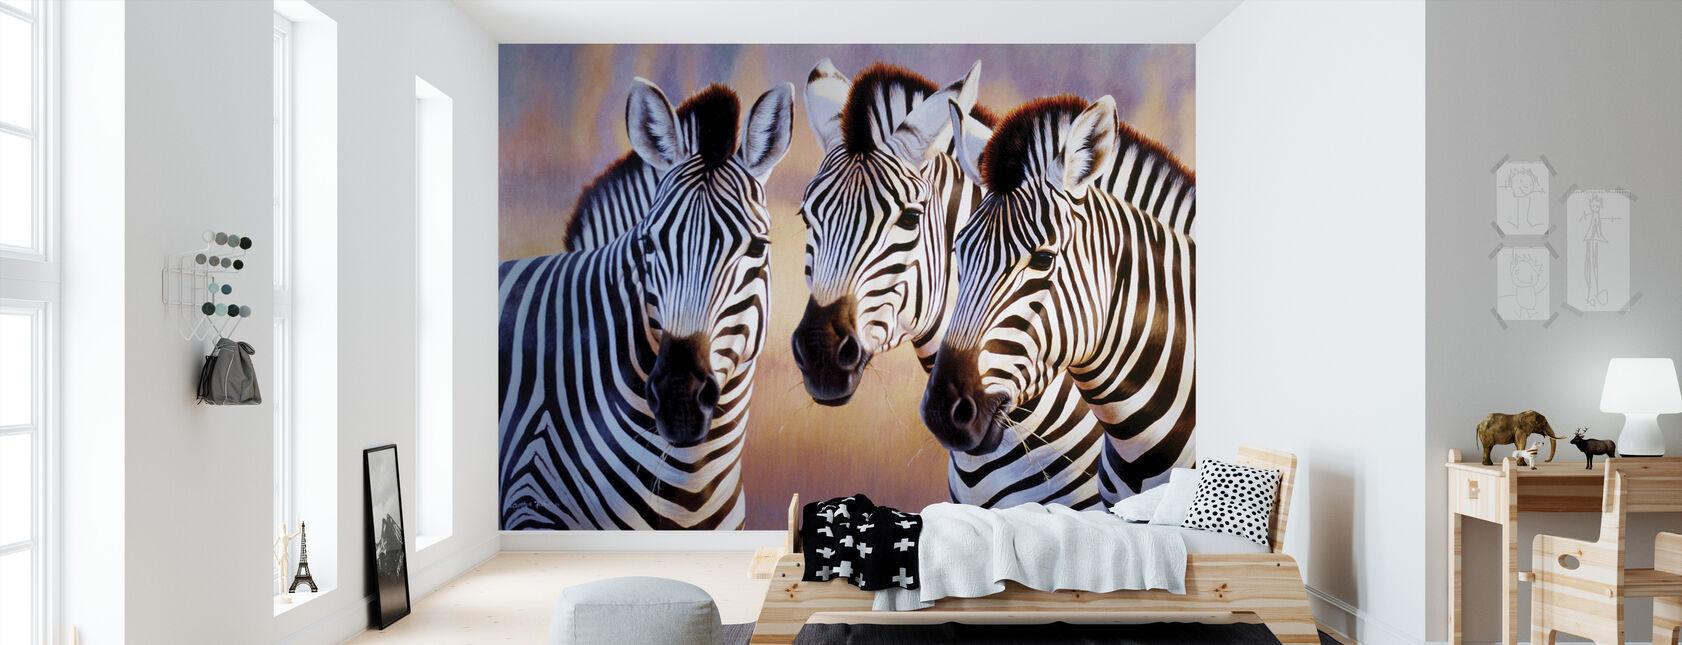 Stora Zebra huvuden - Tapet - Barnrum